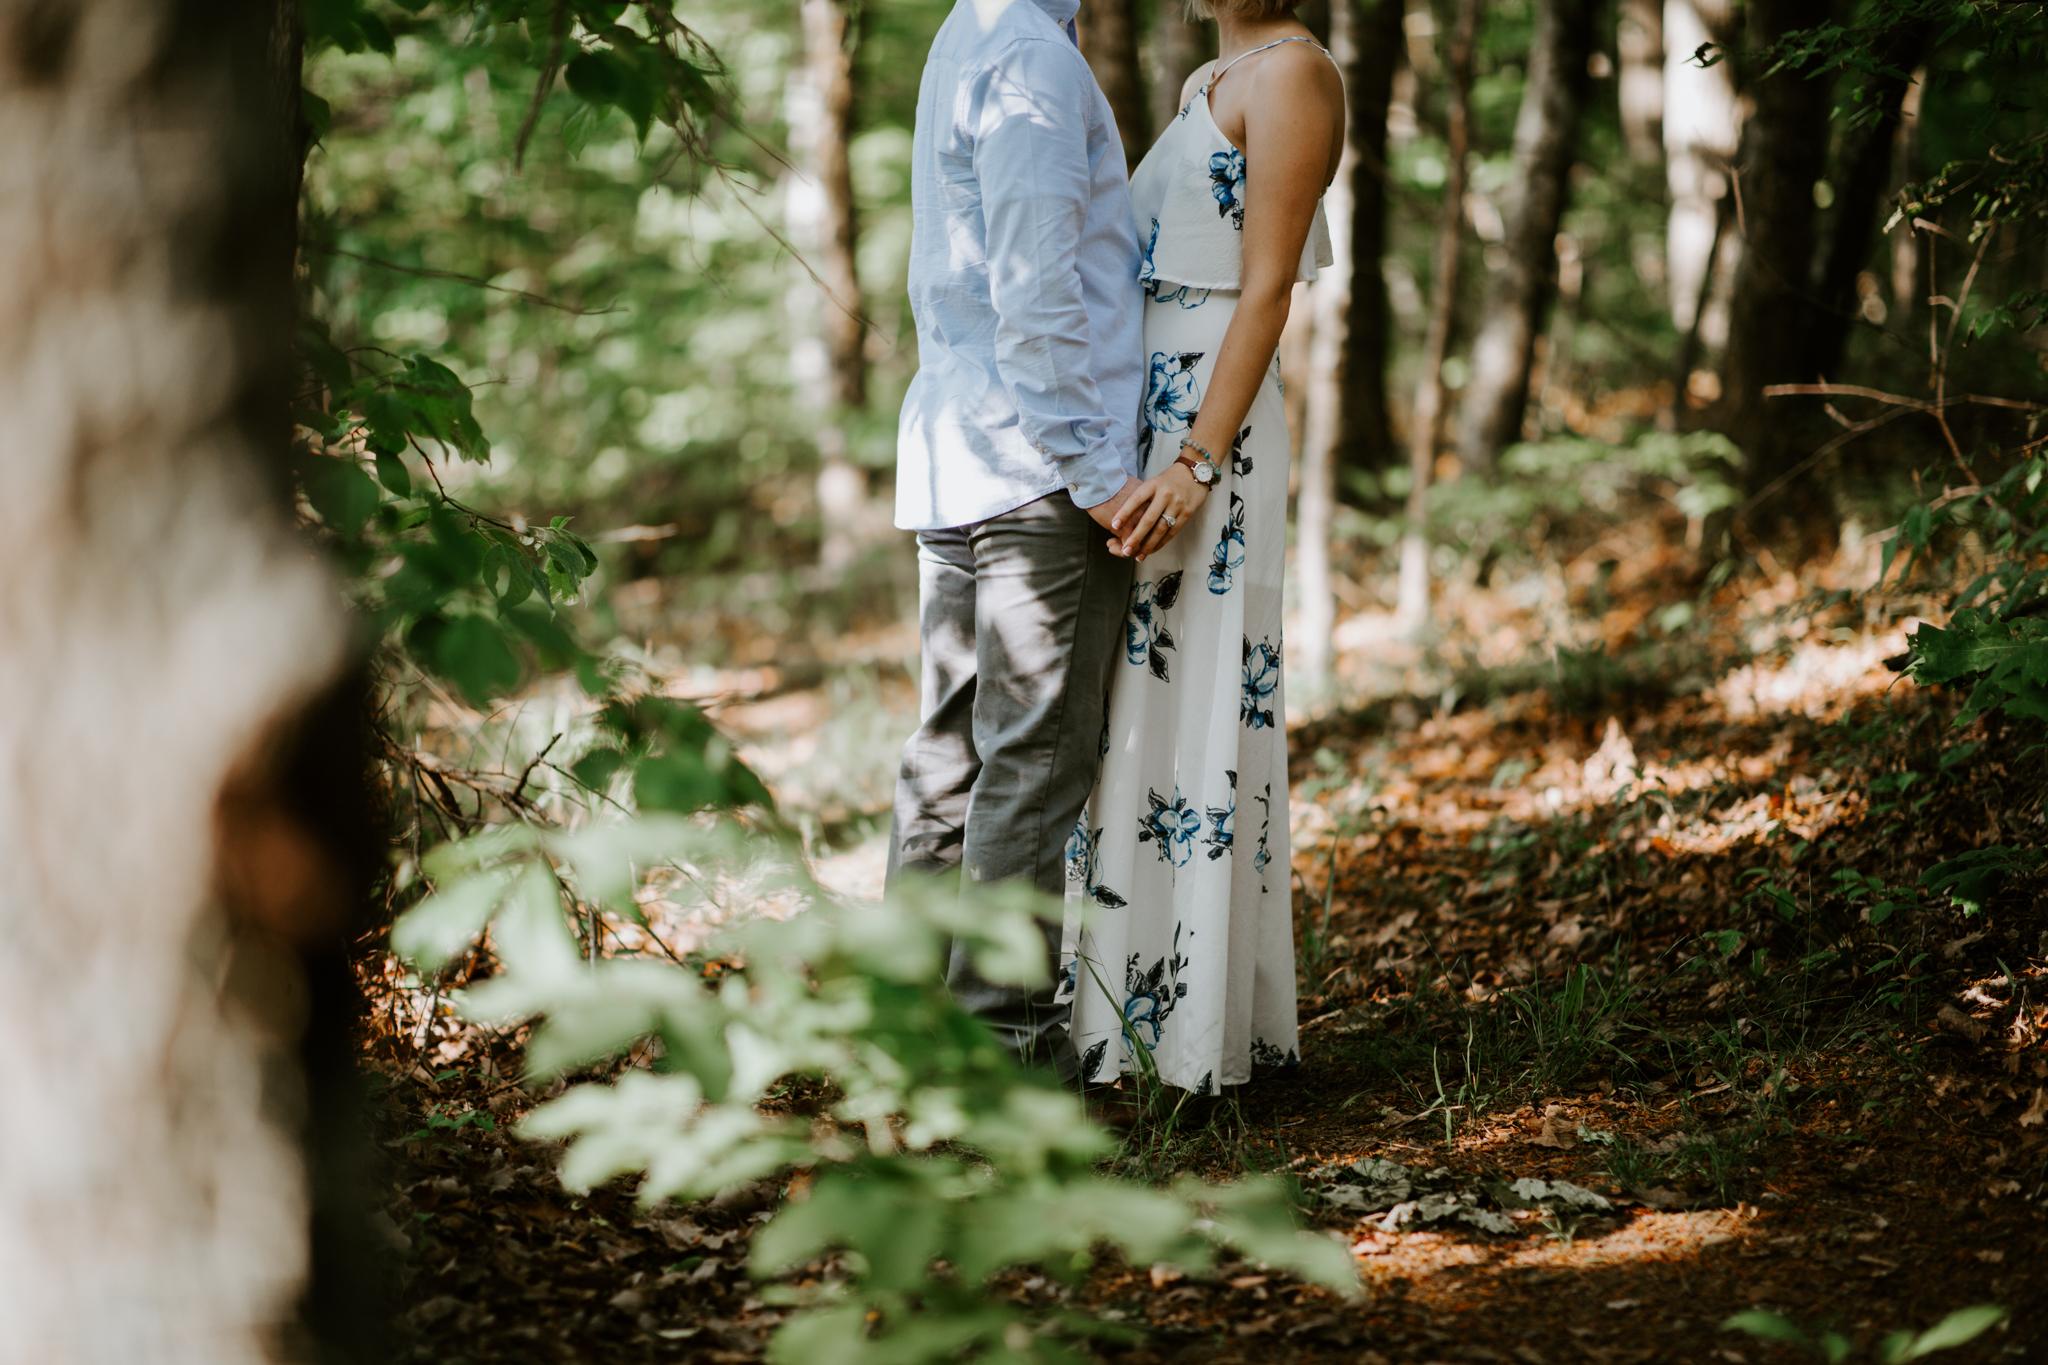 Courtney-Jordan-Chattanooga-Nashville-Tennessee-Wedding-Elopement-Photographer-22.jpg